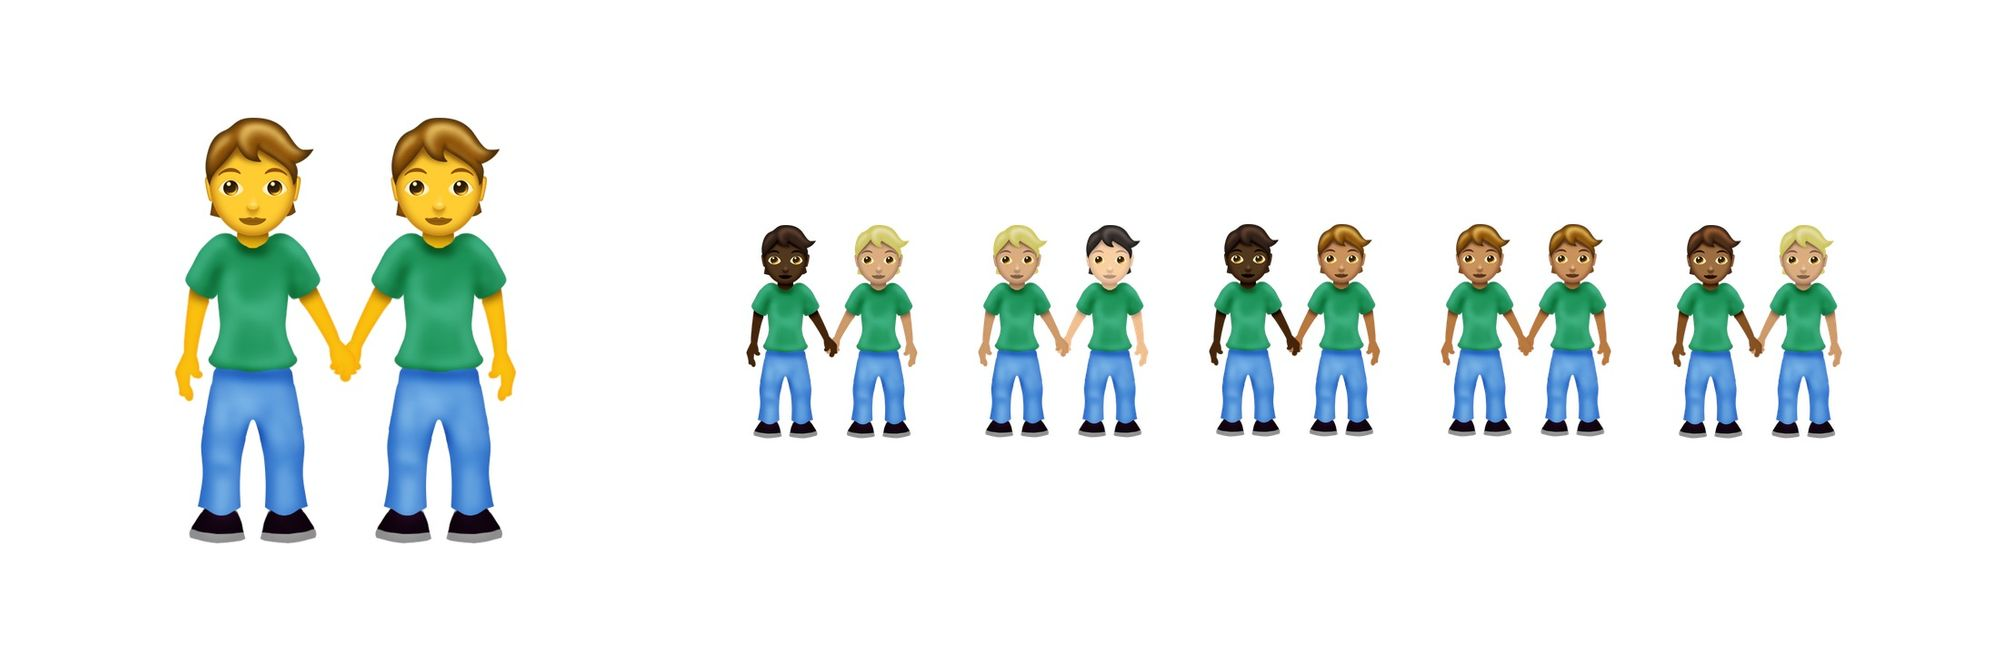 gender-inclusive-holding-hands-emojipedia